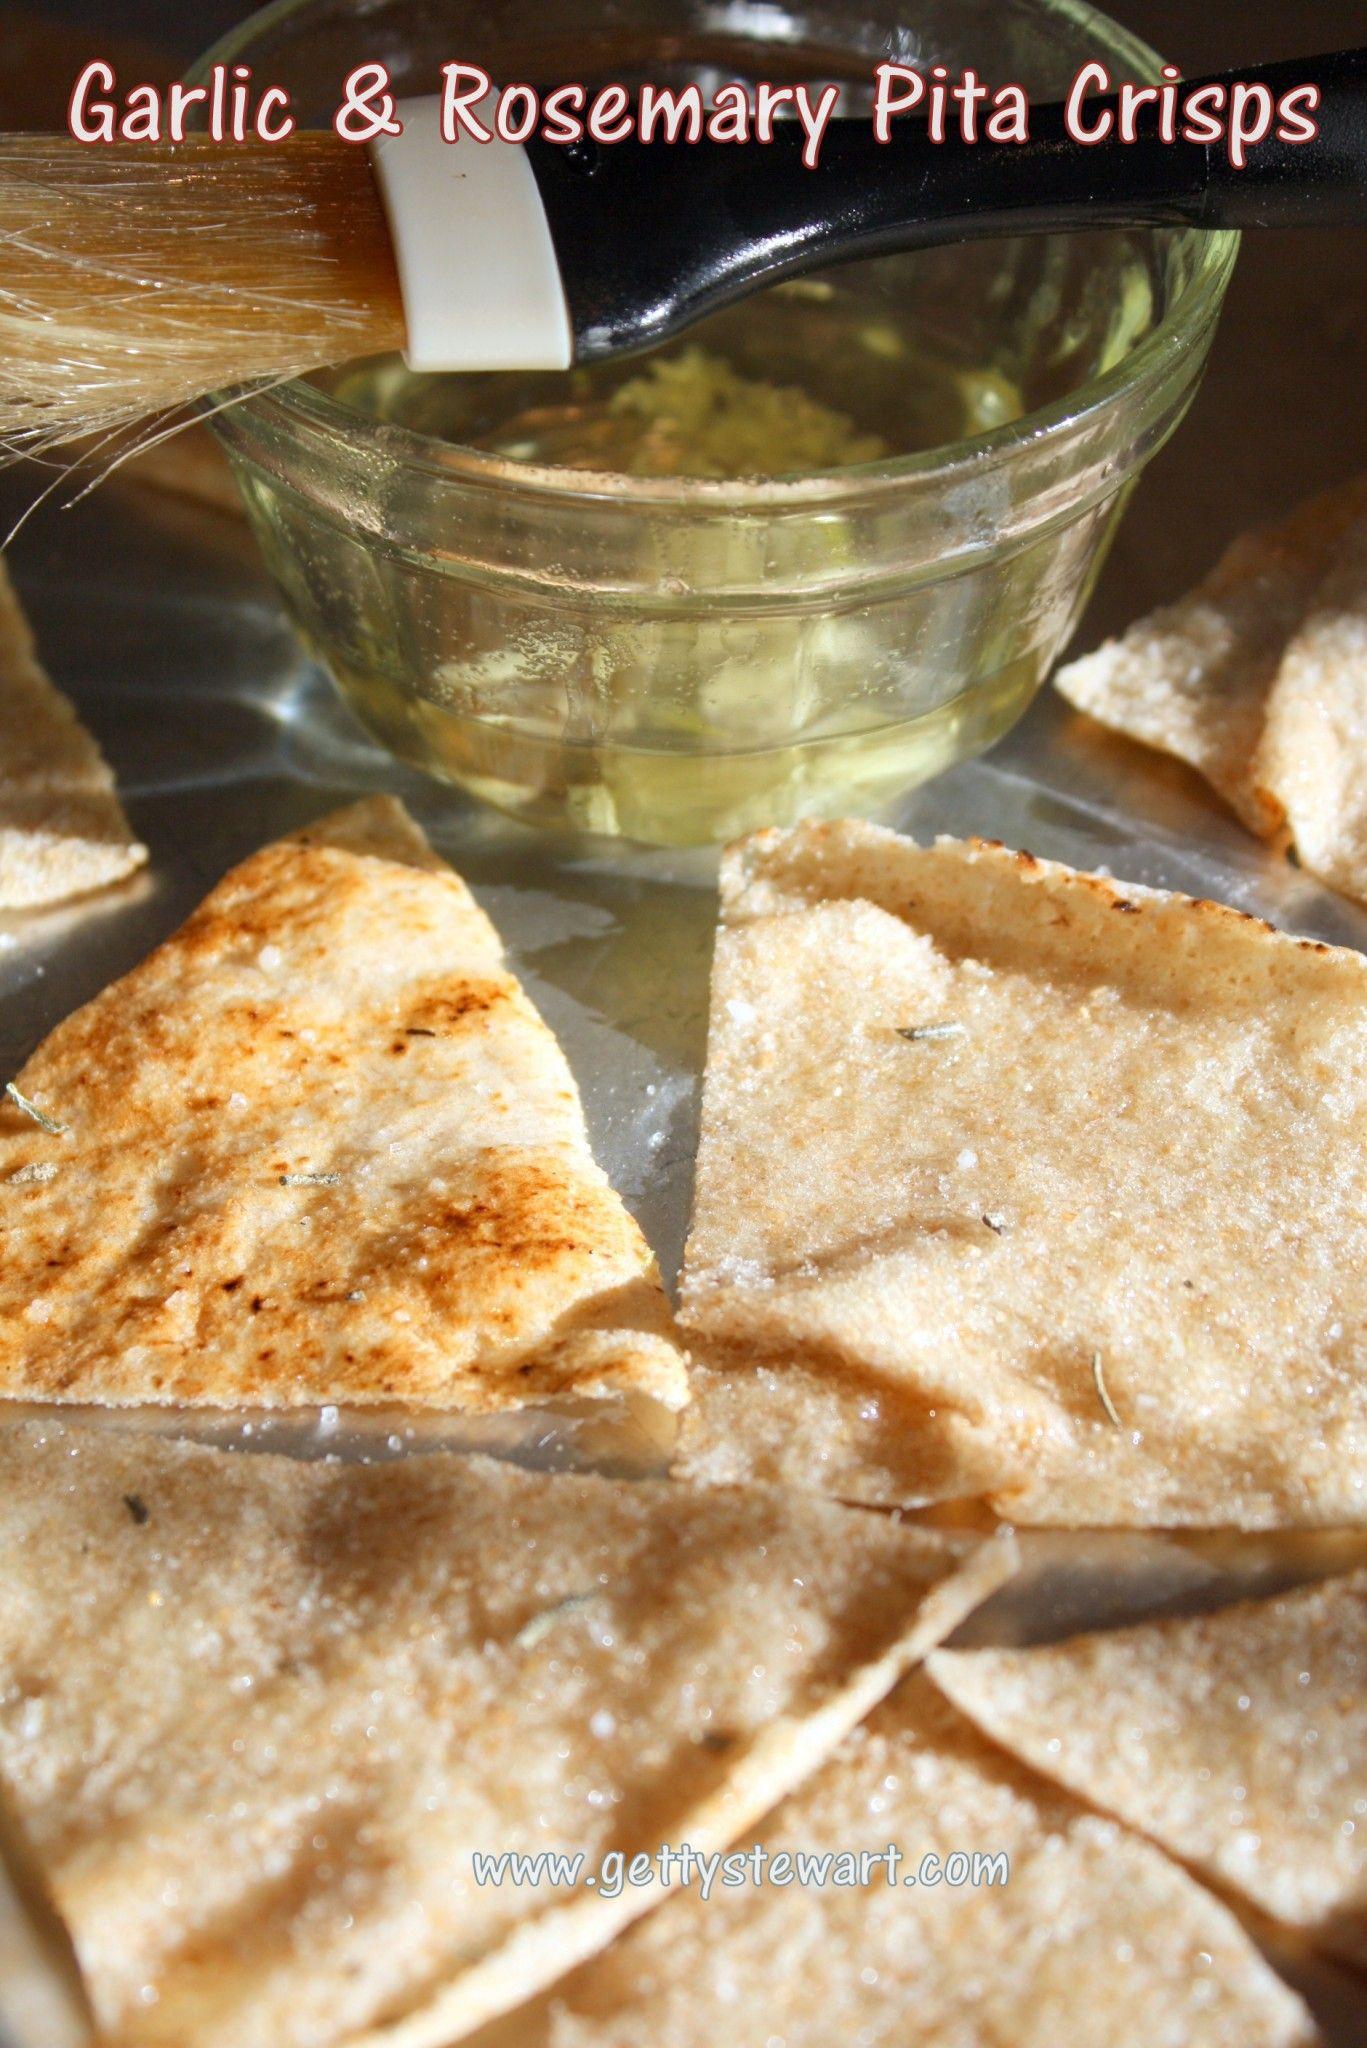 Homemade baked pita crisps with garlic and rosemary salt